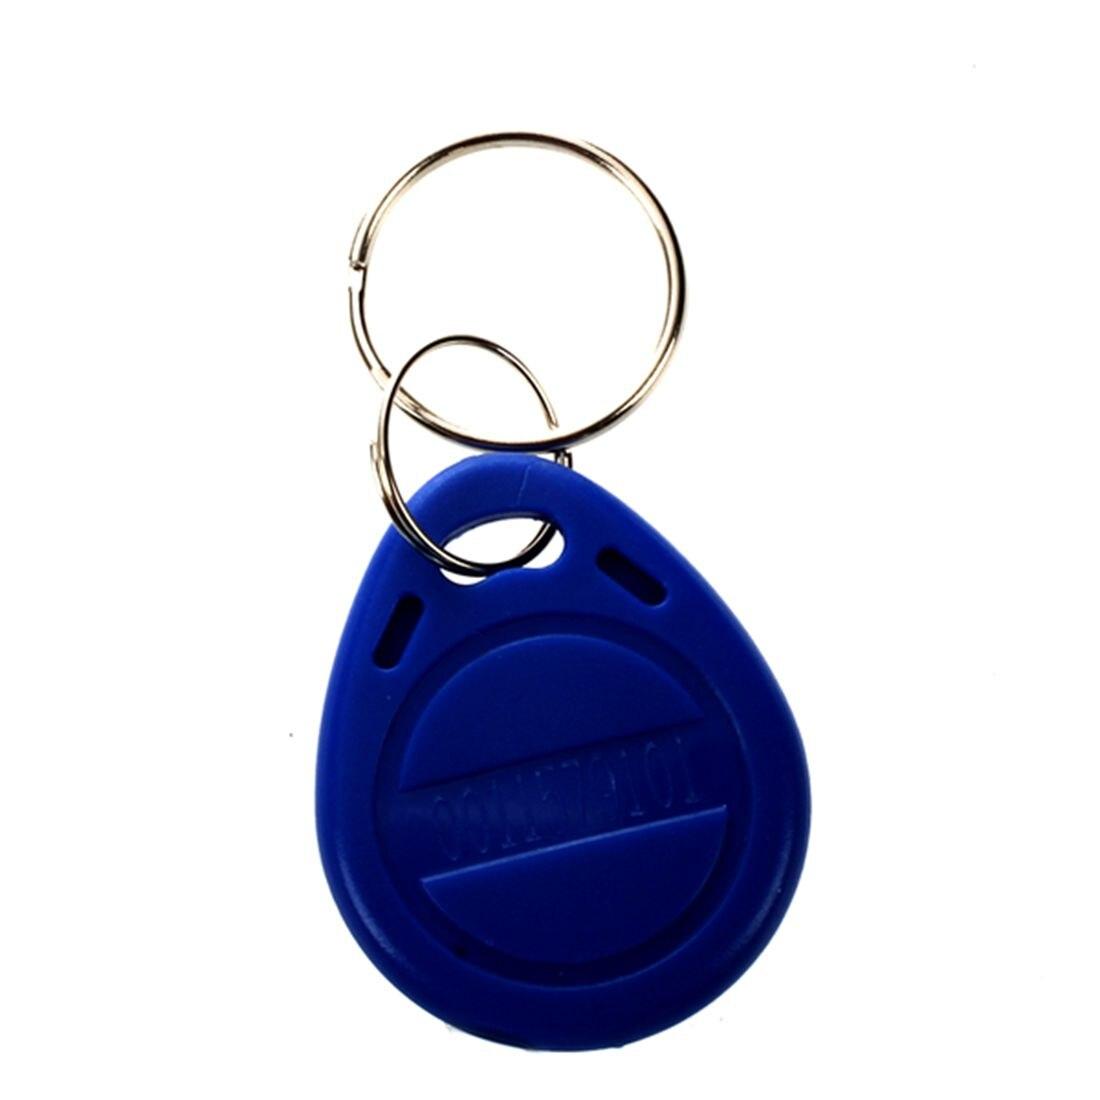 10pcs 125khz RFID Proximity ID Token Key Tag Keychain Waterproof New10pcs 125khz RFID Proximity ID Token Key Tag Keychain Waterproof New